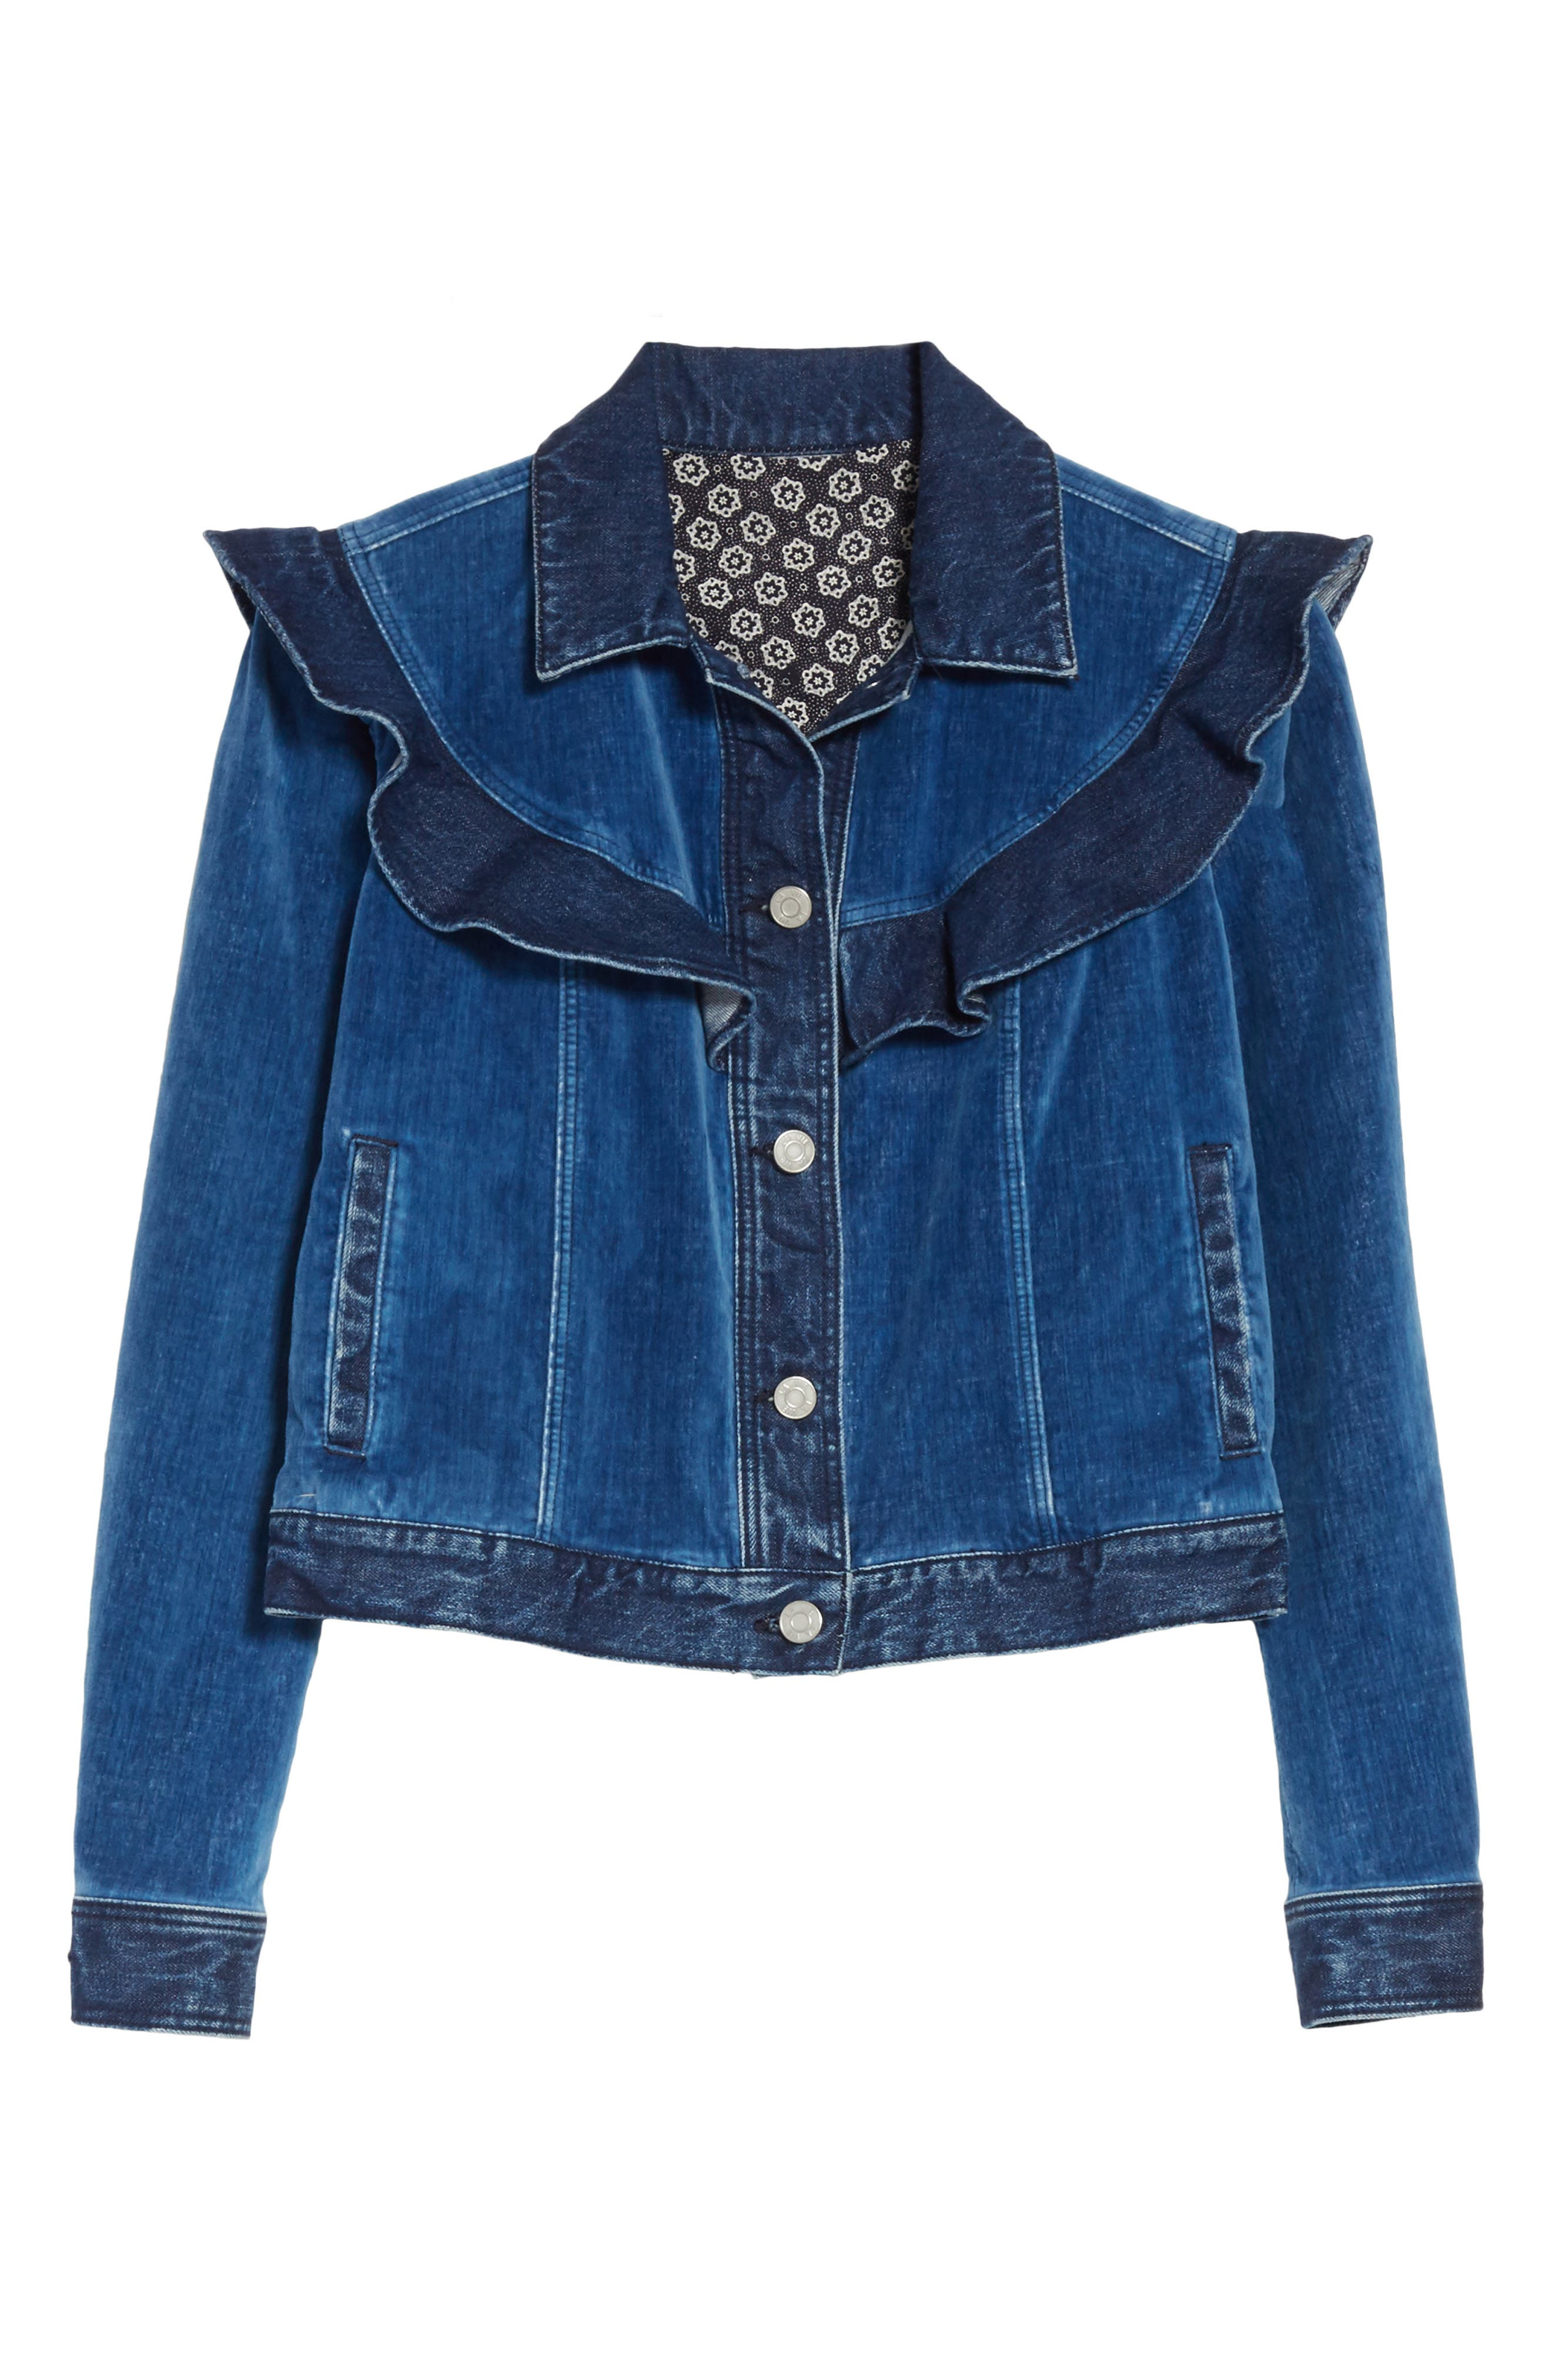 Velvet Denim Jacket,                             Alternate thumbnail 6, color,                             Dark Blueprint Patch Wash